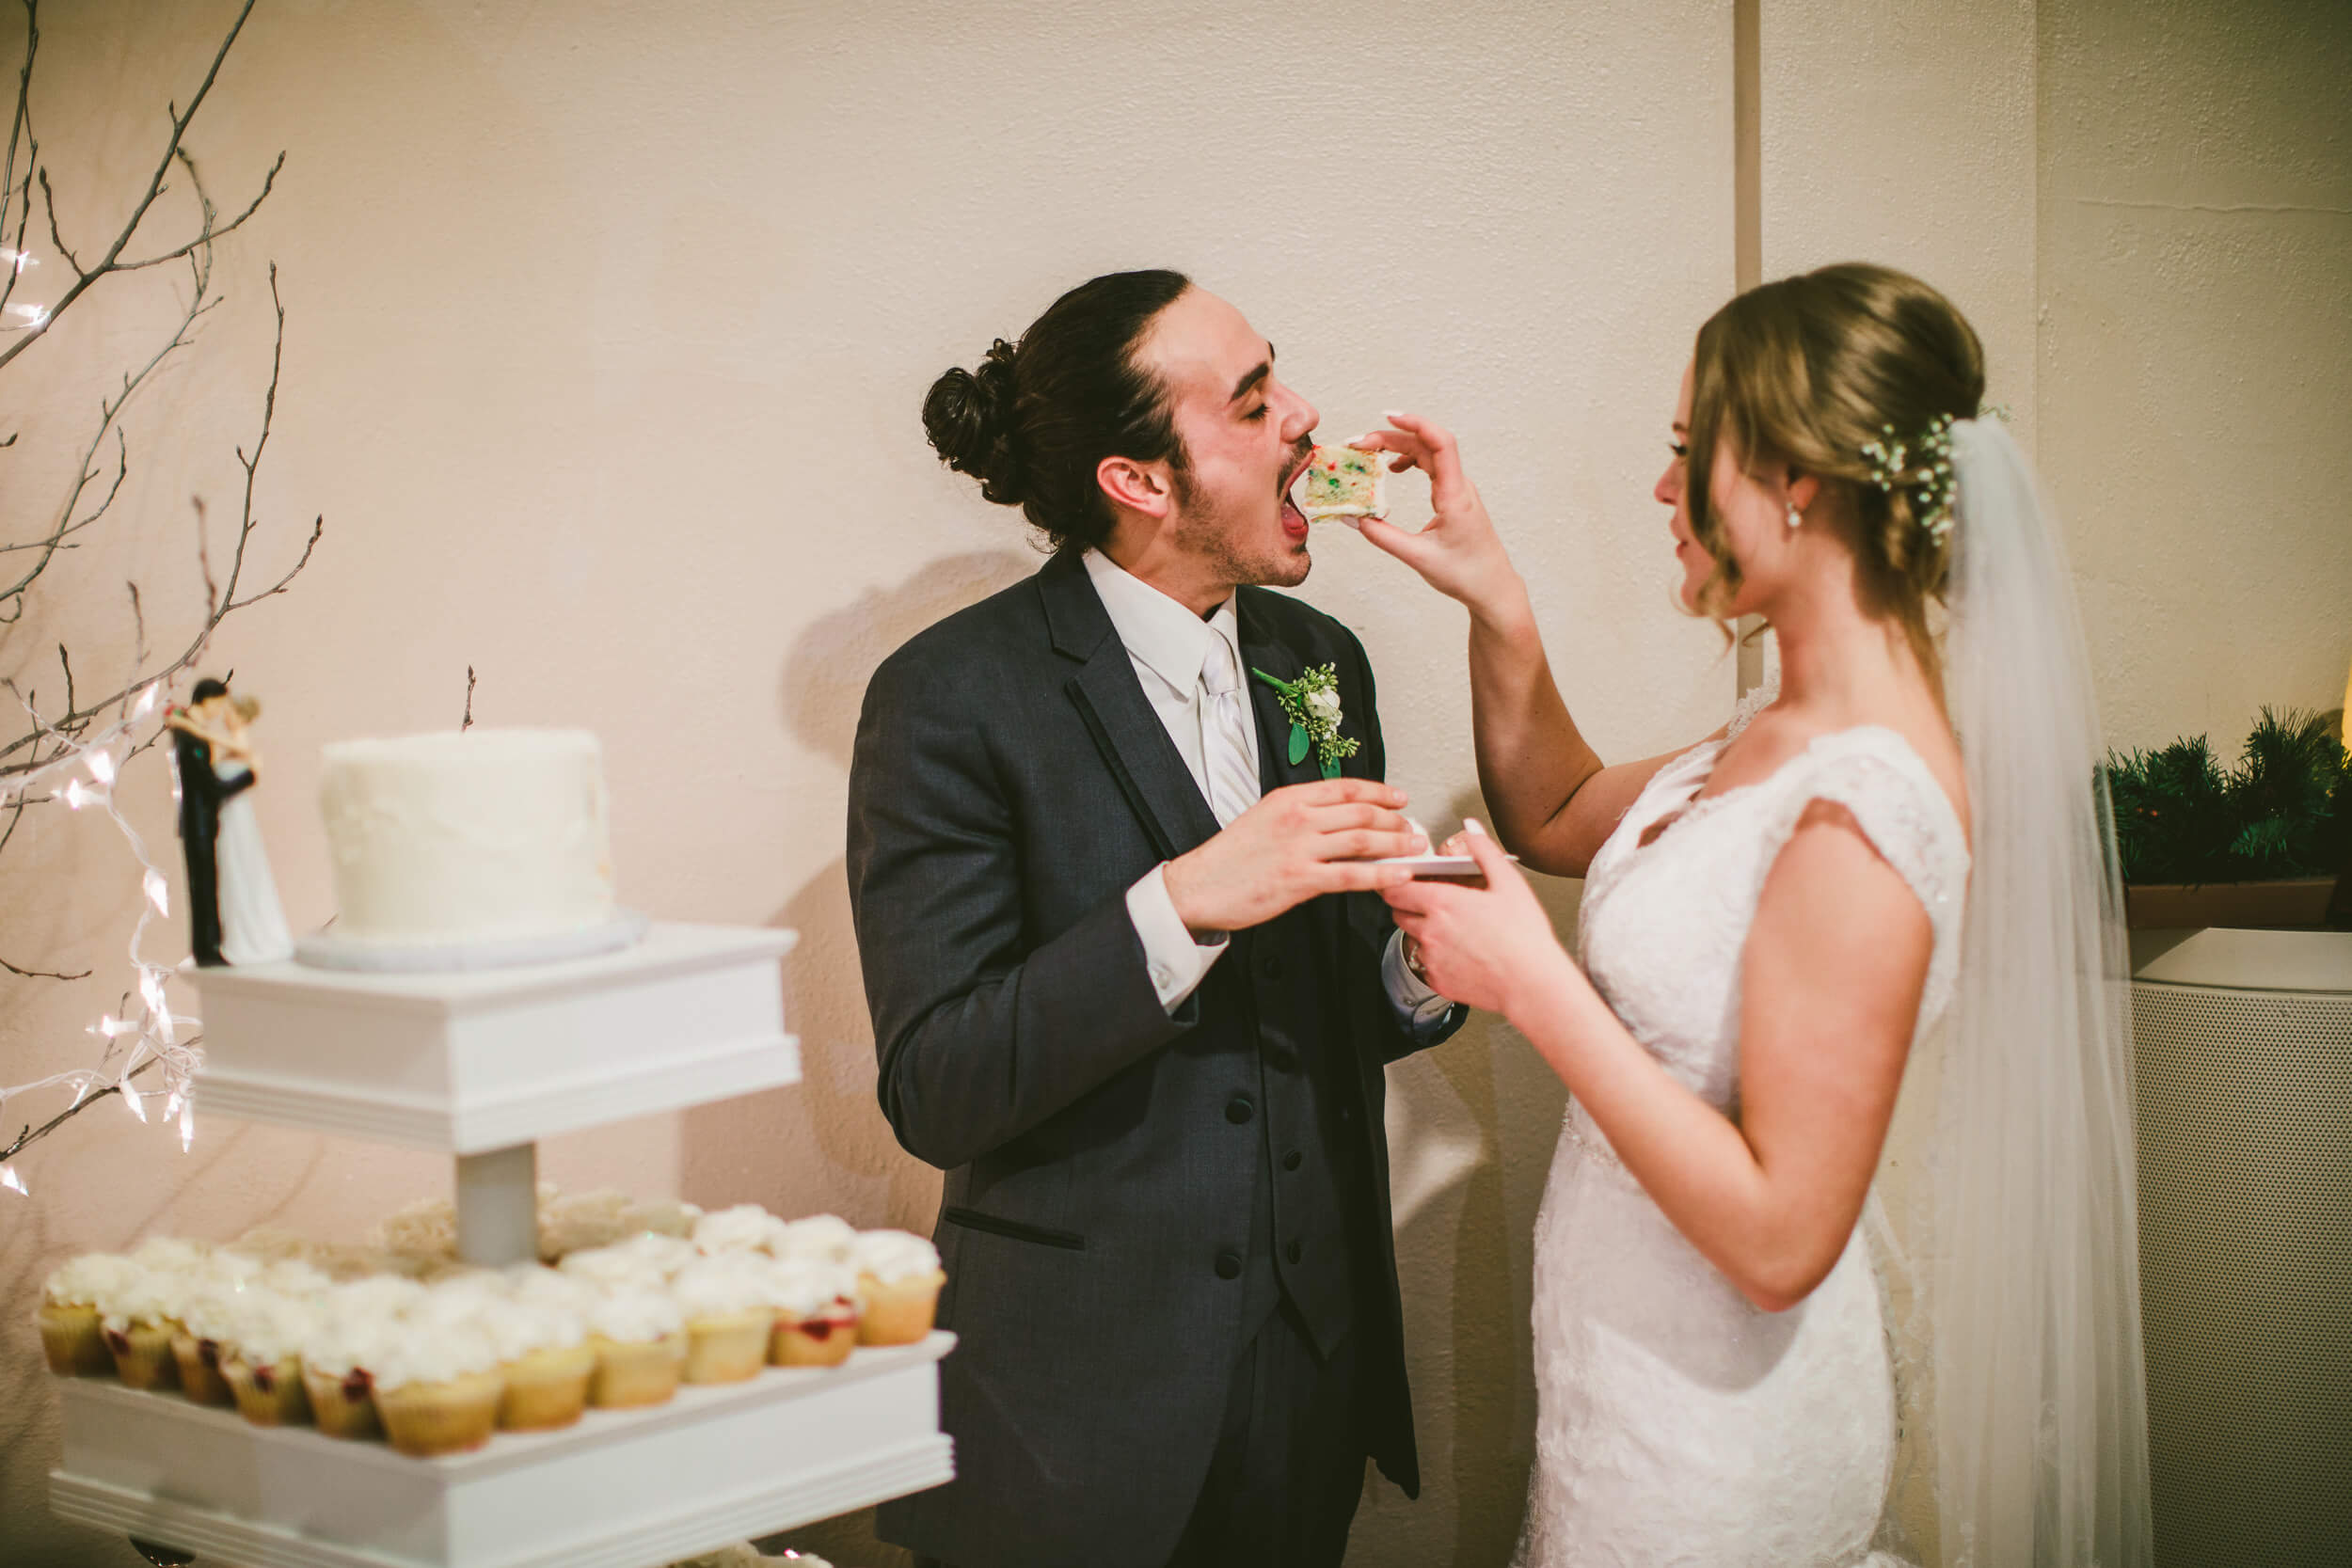 mukogawa winter wedding in spokane (322).jpg